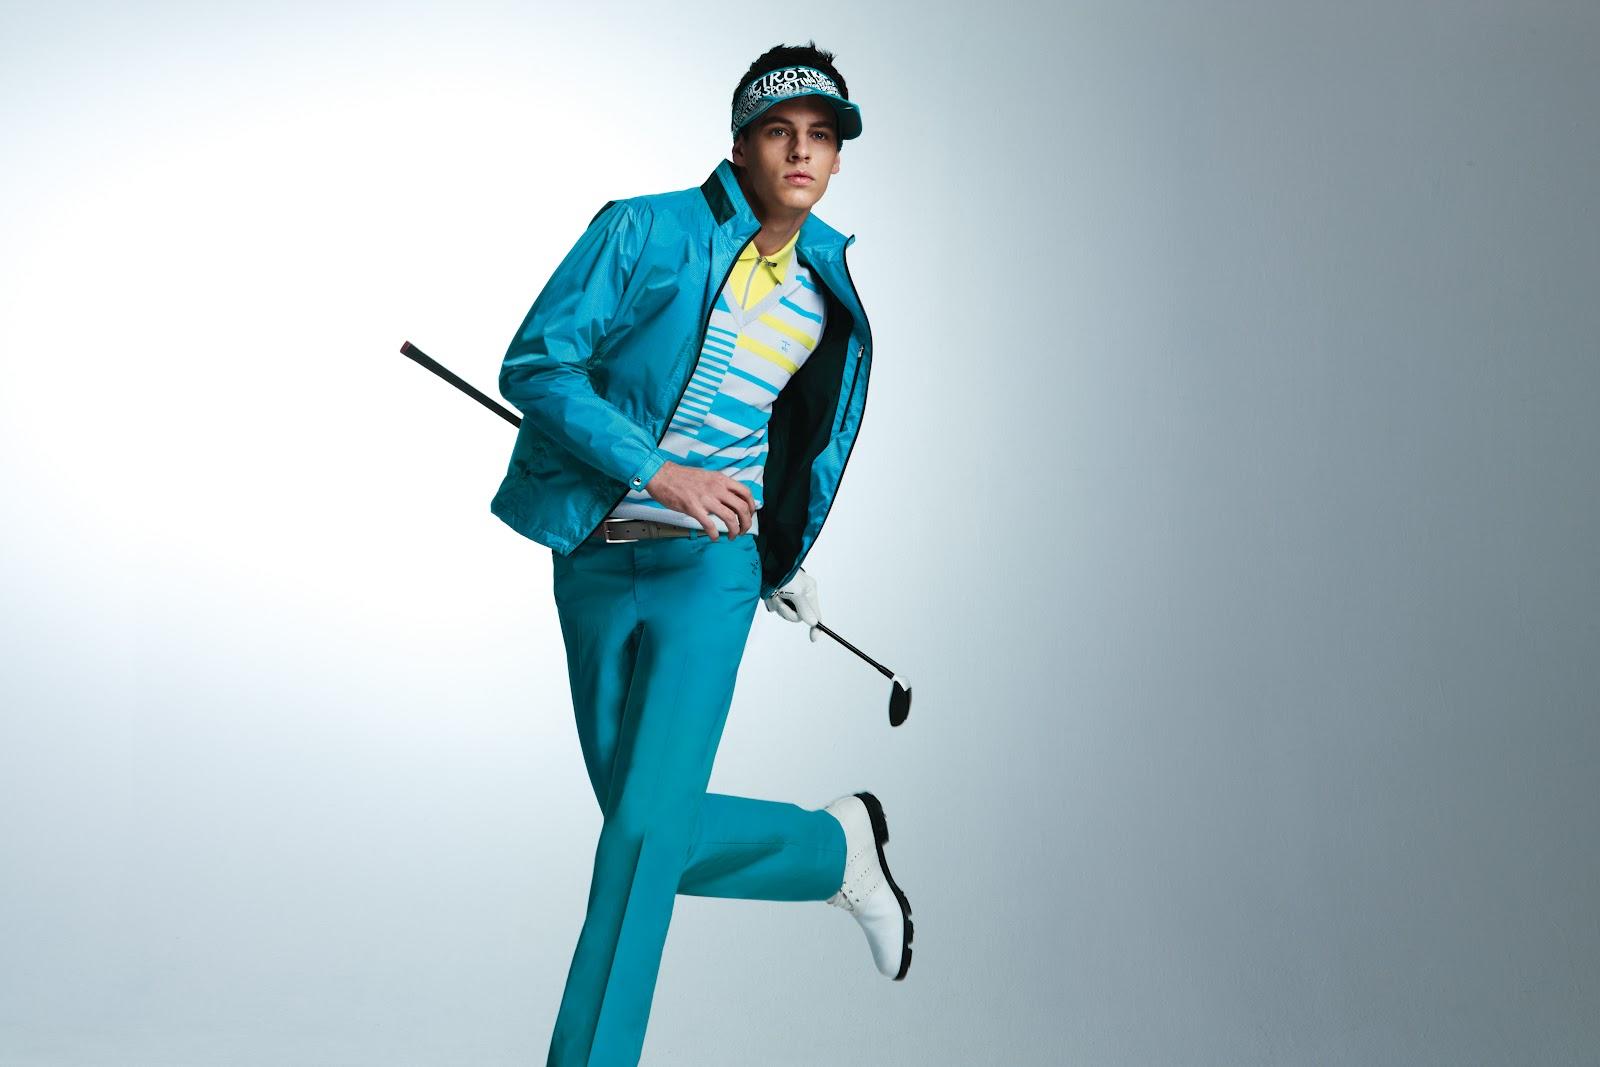 golf wear: